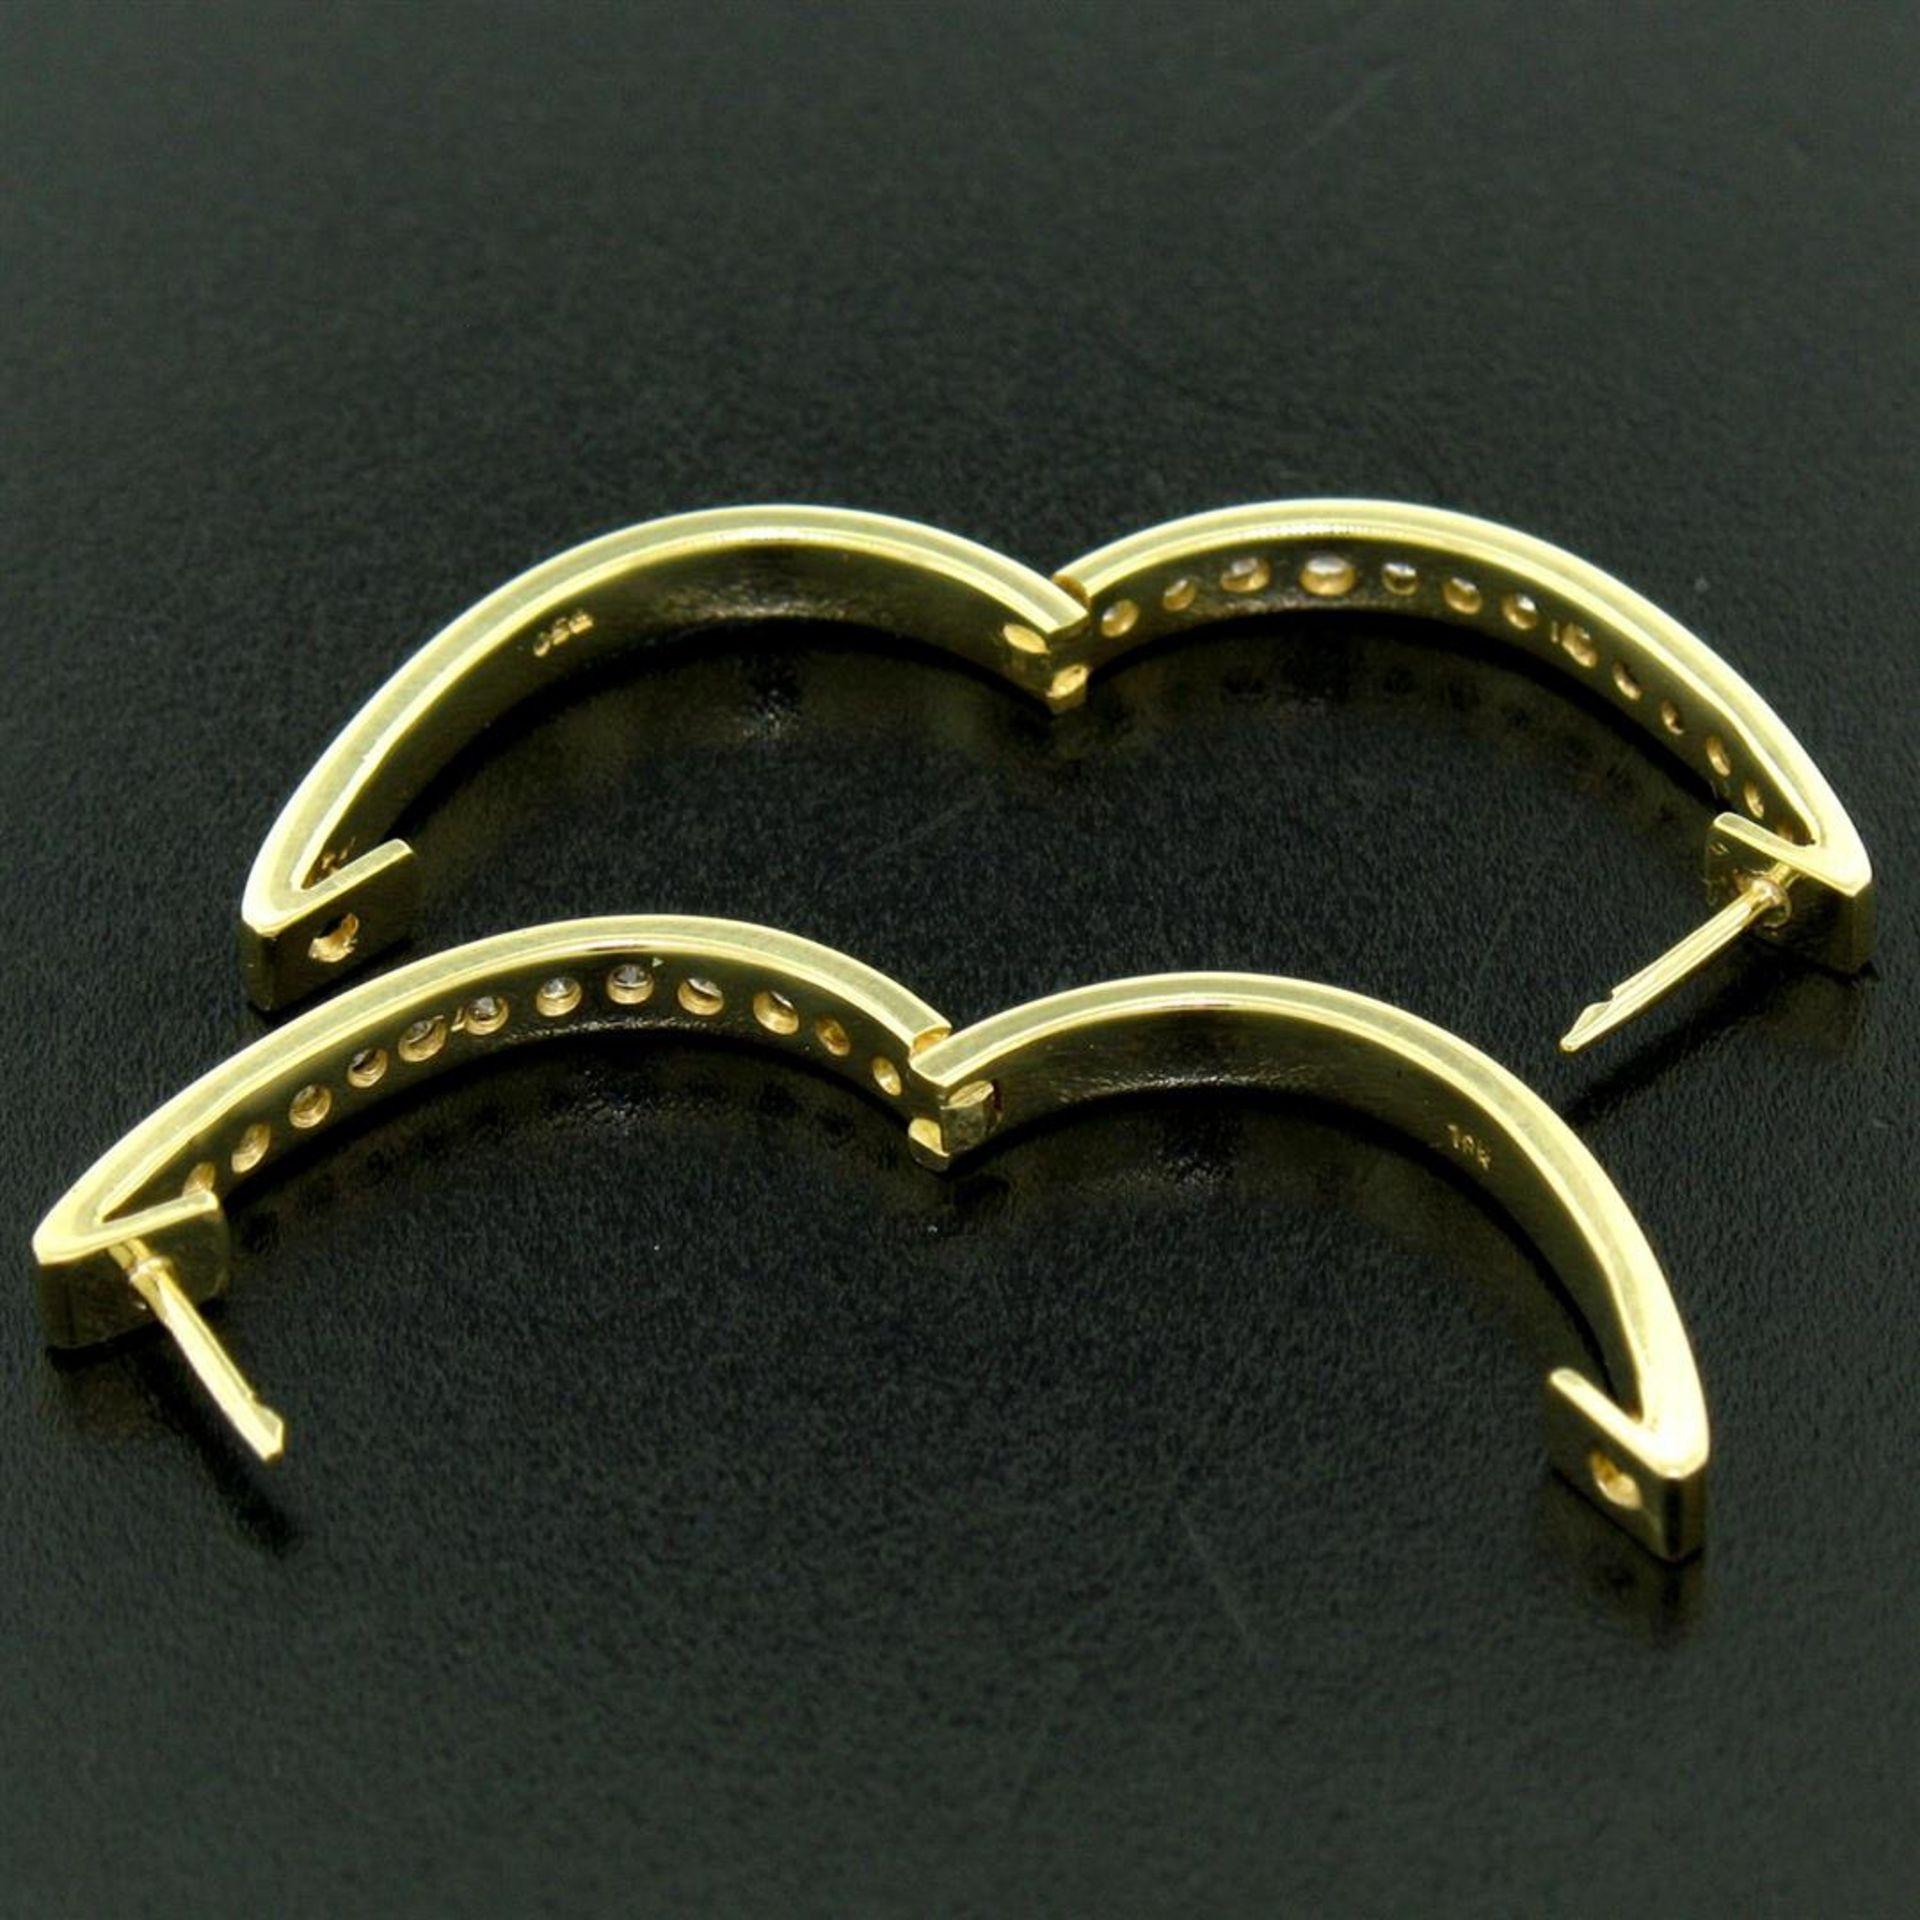 18kt Yellow Gold 0.75ctw Diamond Oval Hoop Earrings - Image 6 of 7